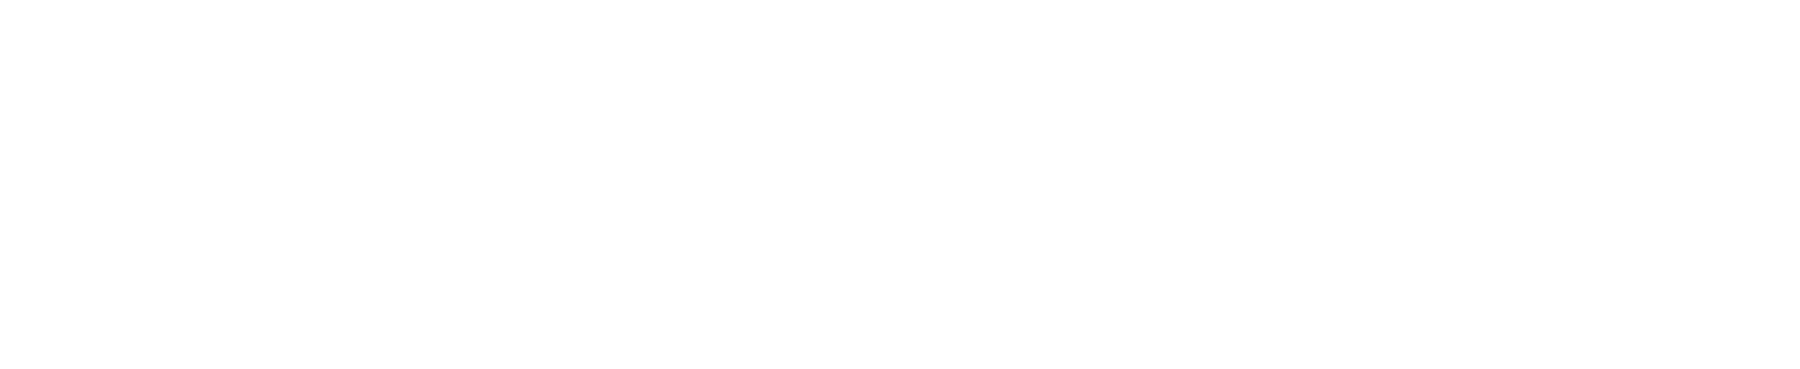 sydney-ducks-logo-white-on-trans